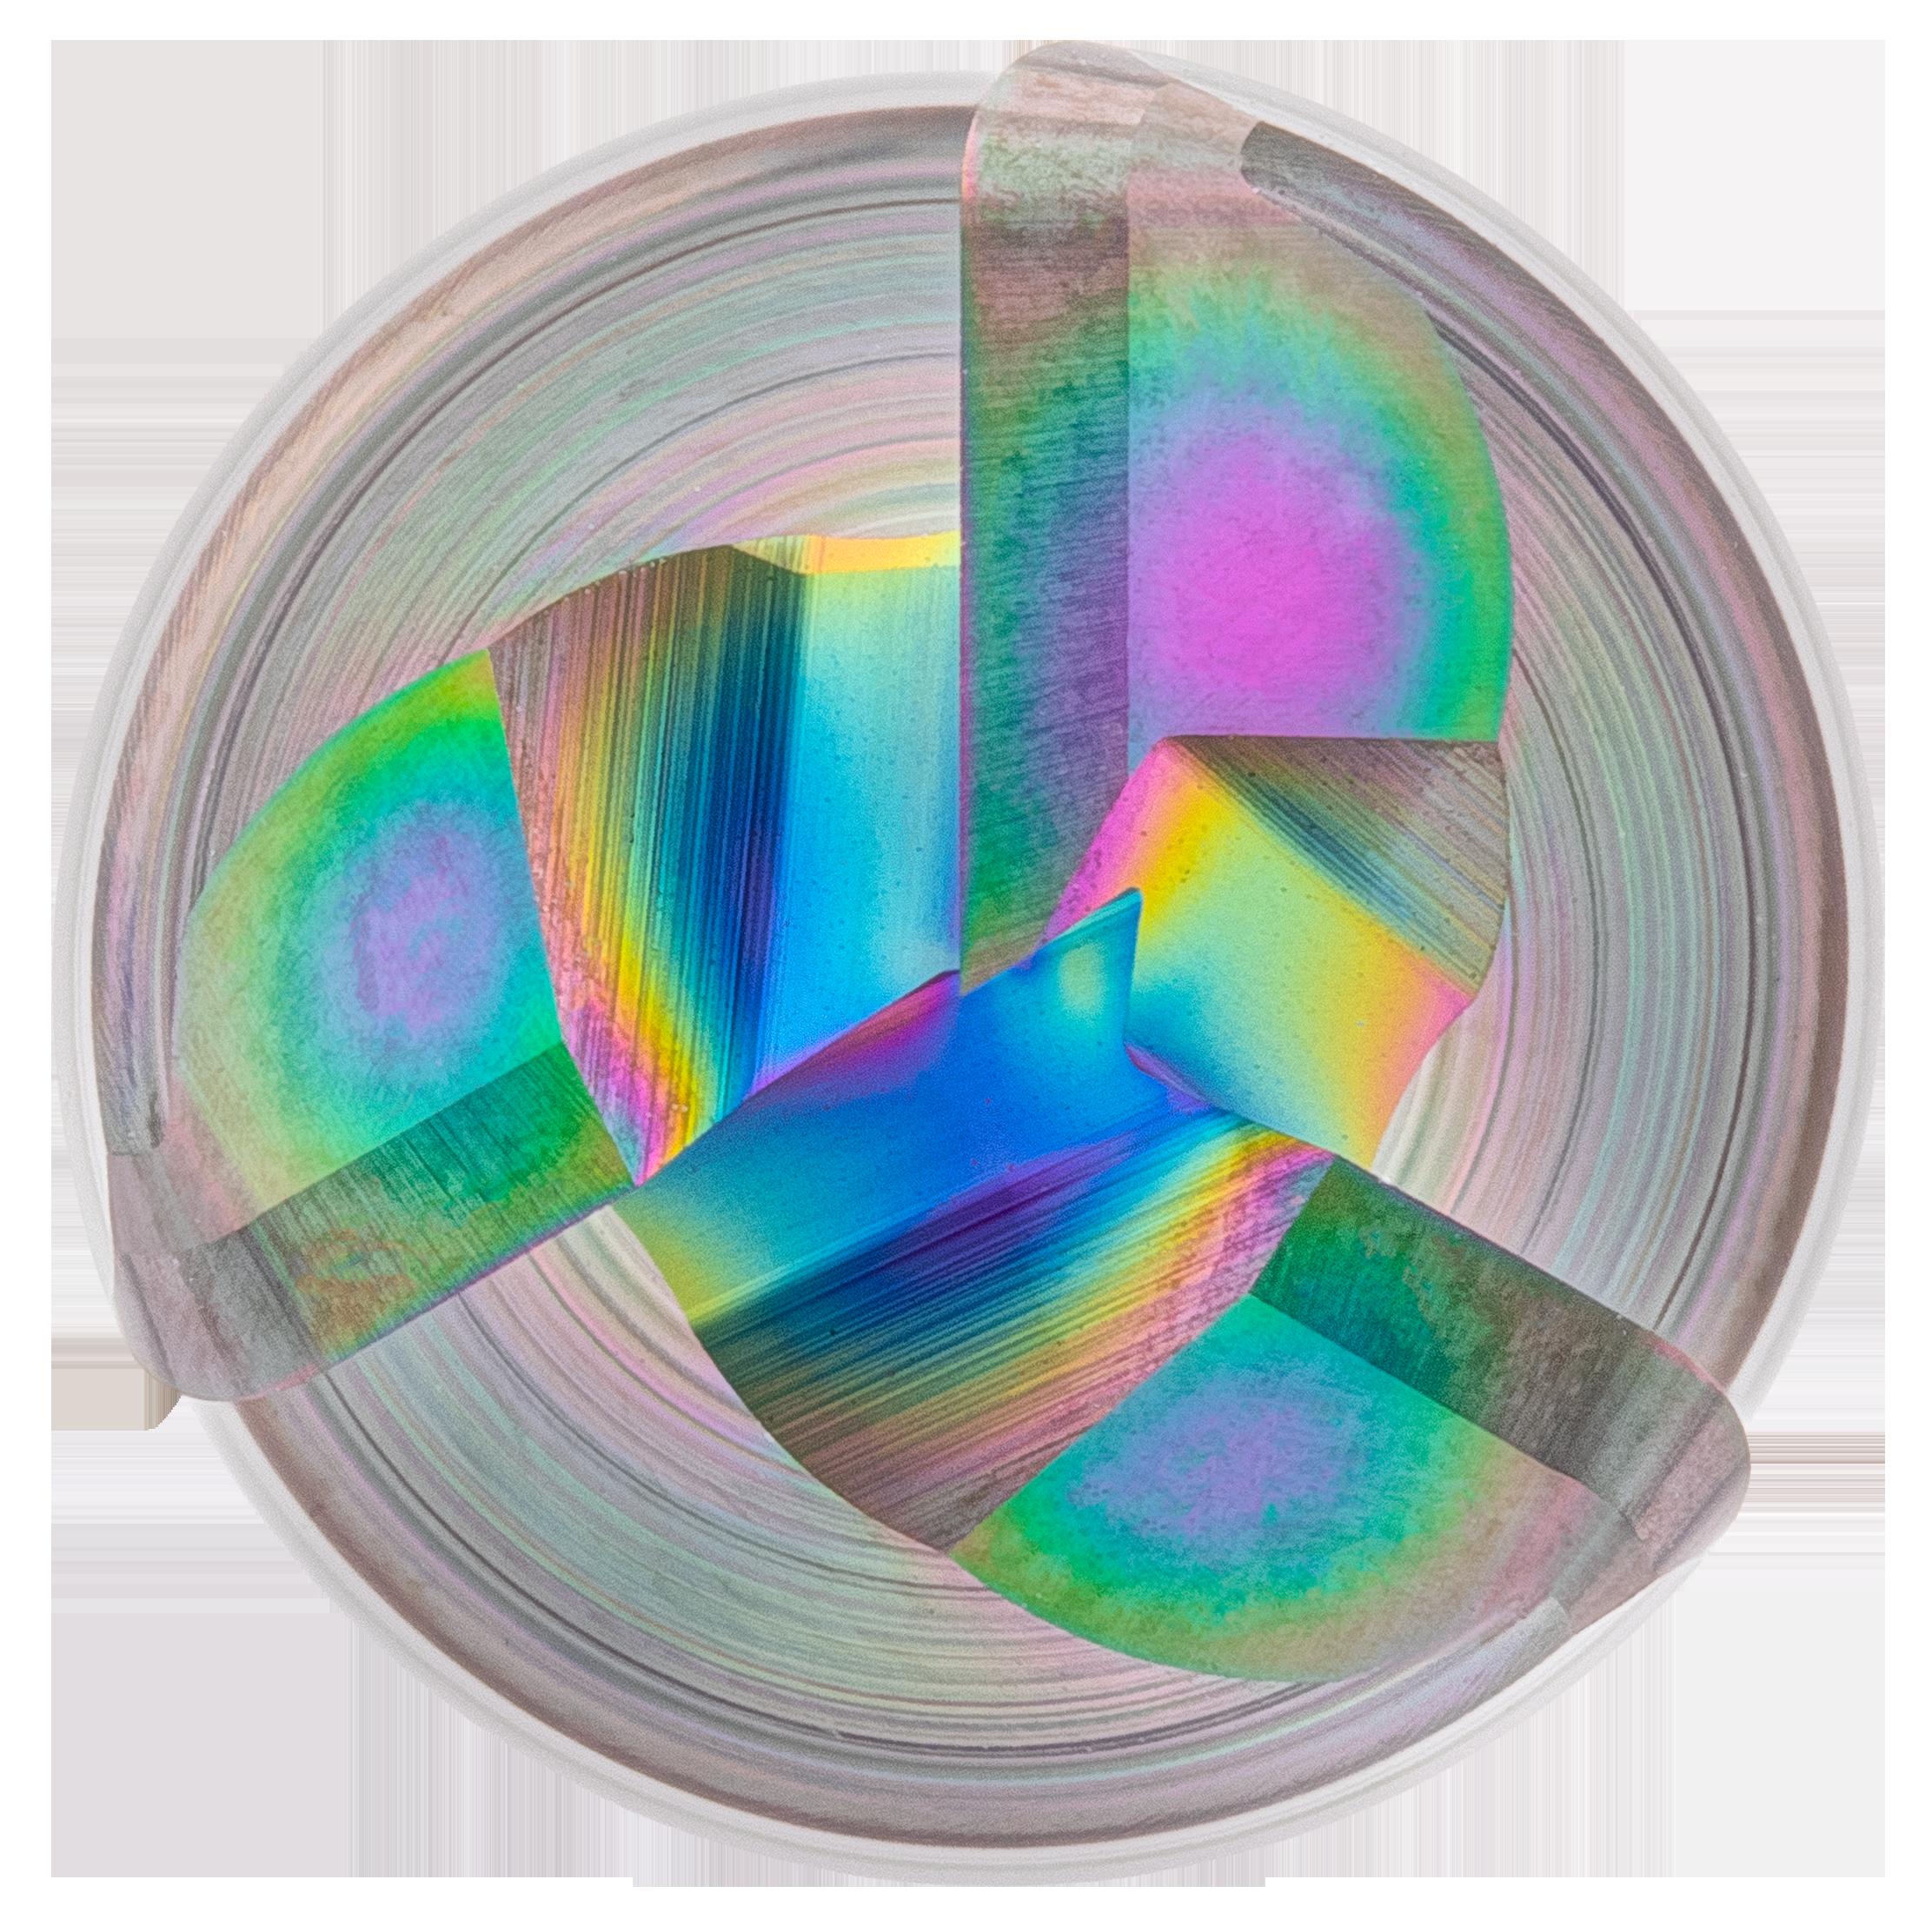 EXN1-M06-0013